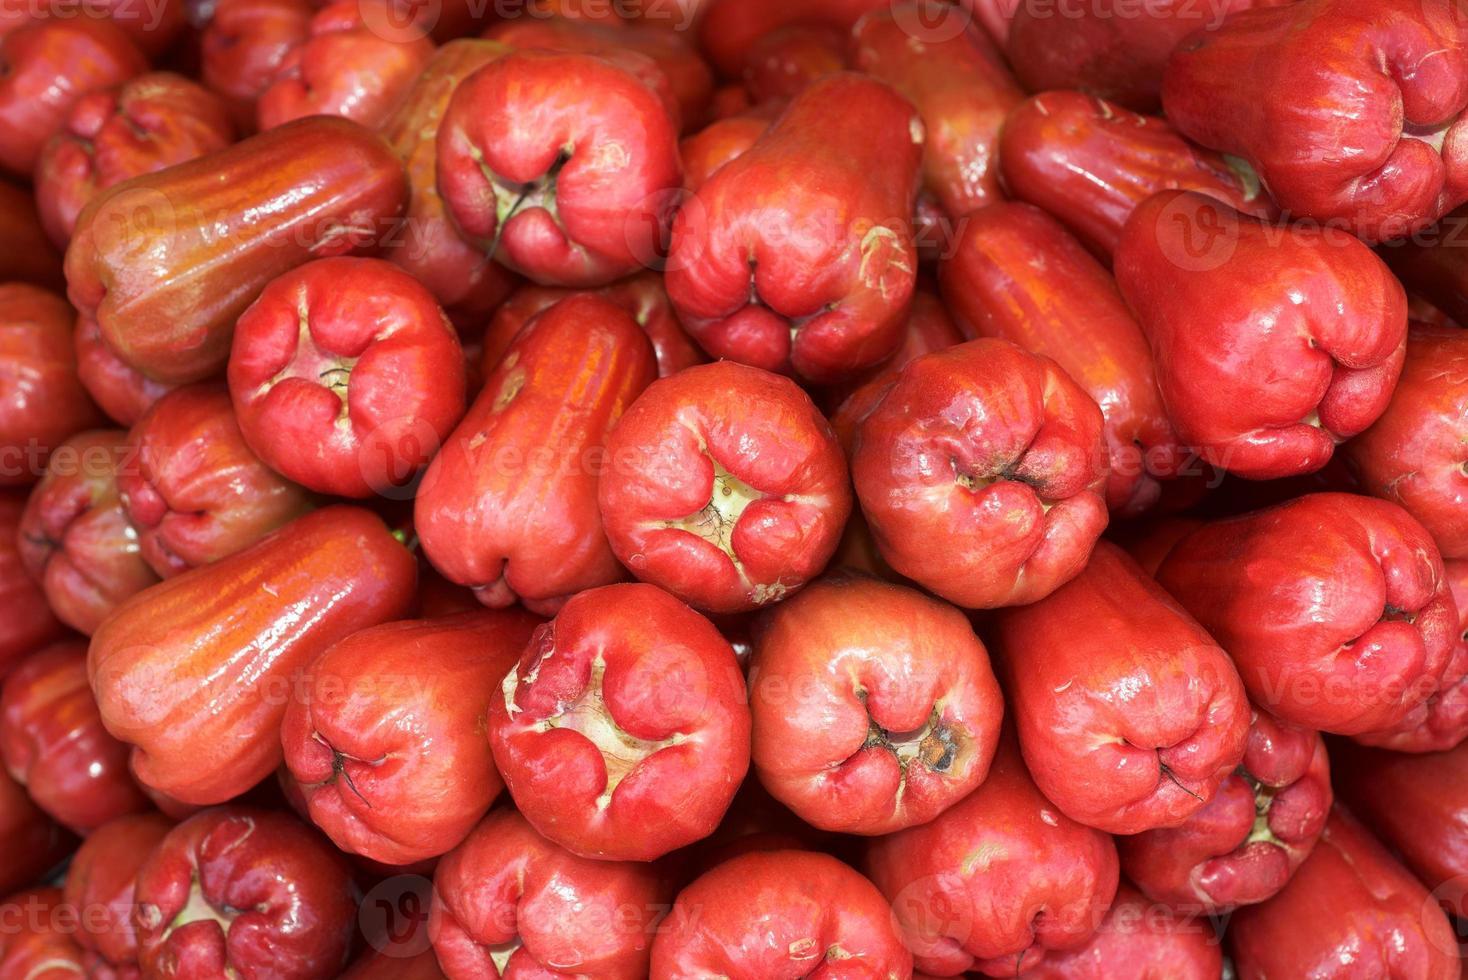 Rosenäpfel auf dem Gemüsemarkt foto